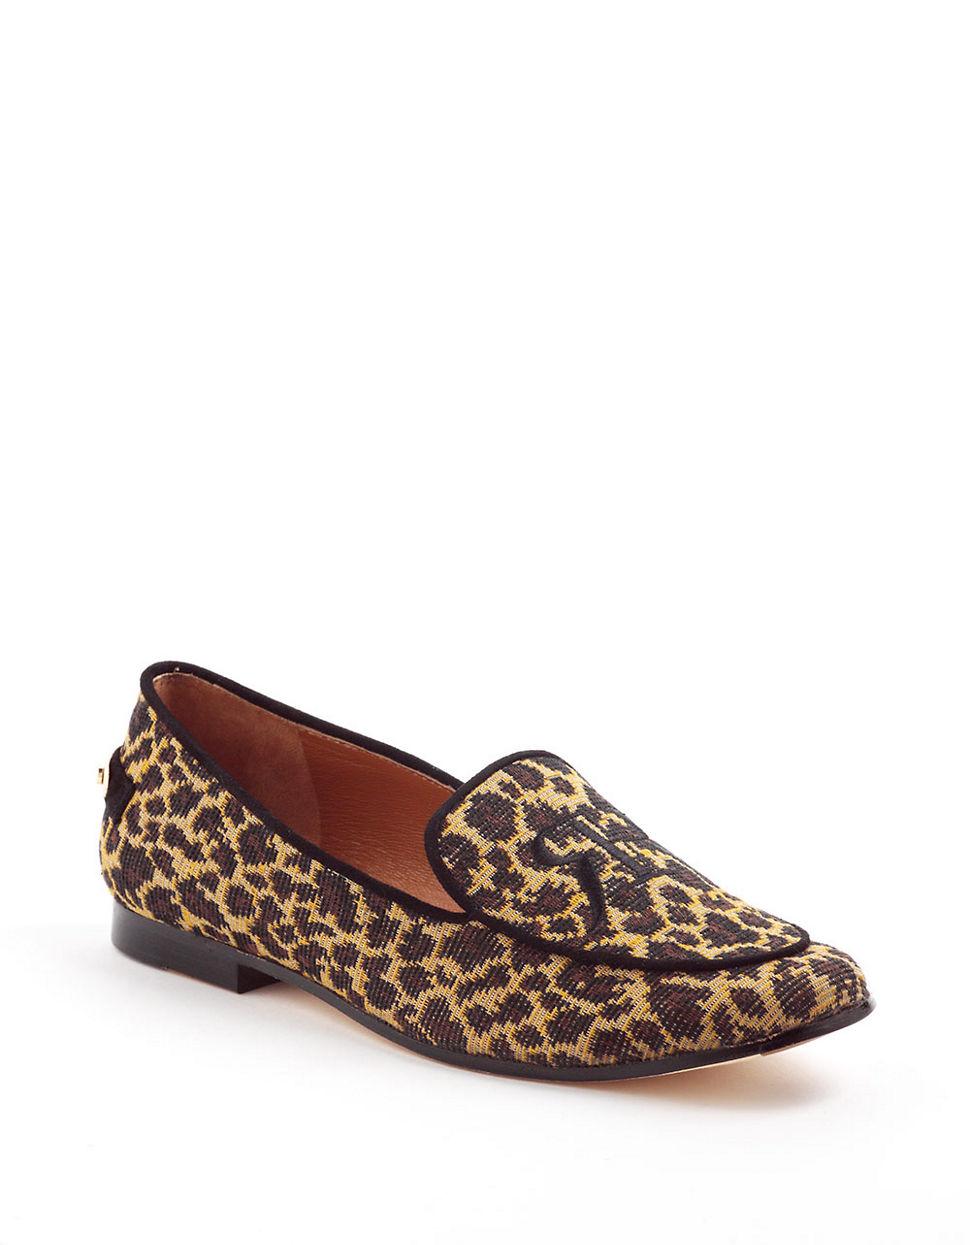 Animal Print Flat Shoes Uk